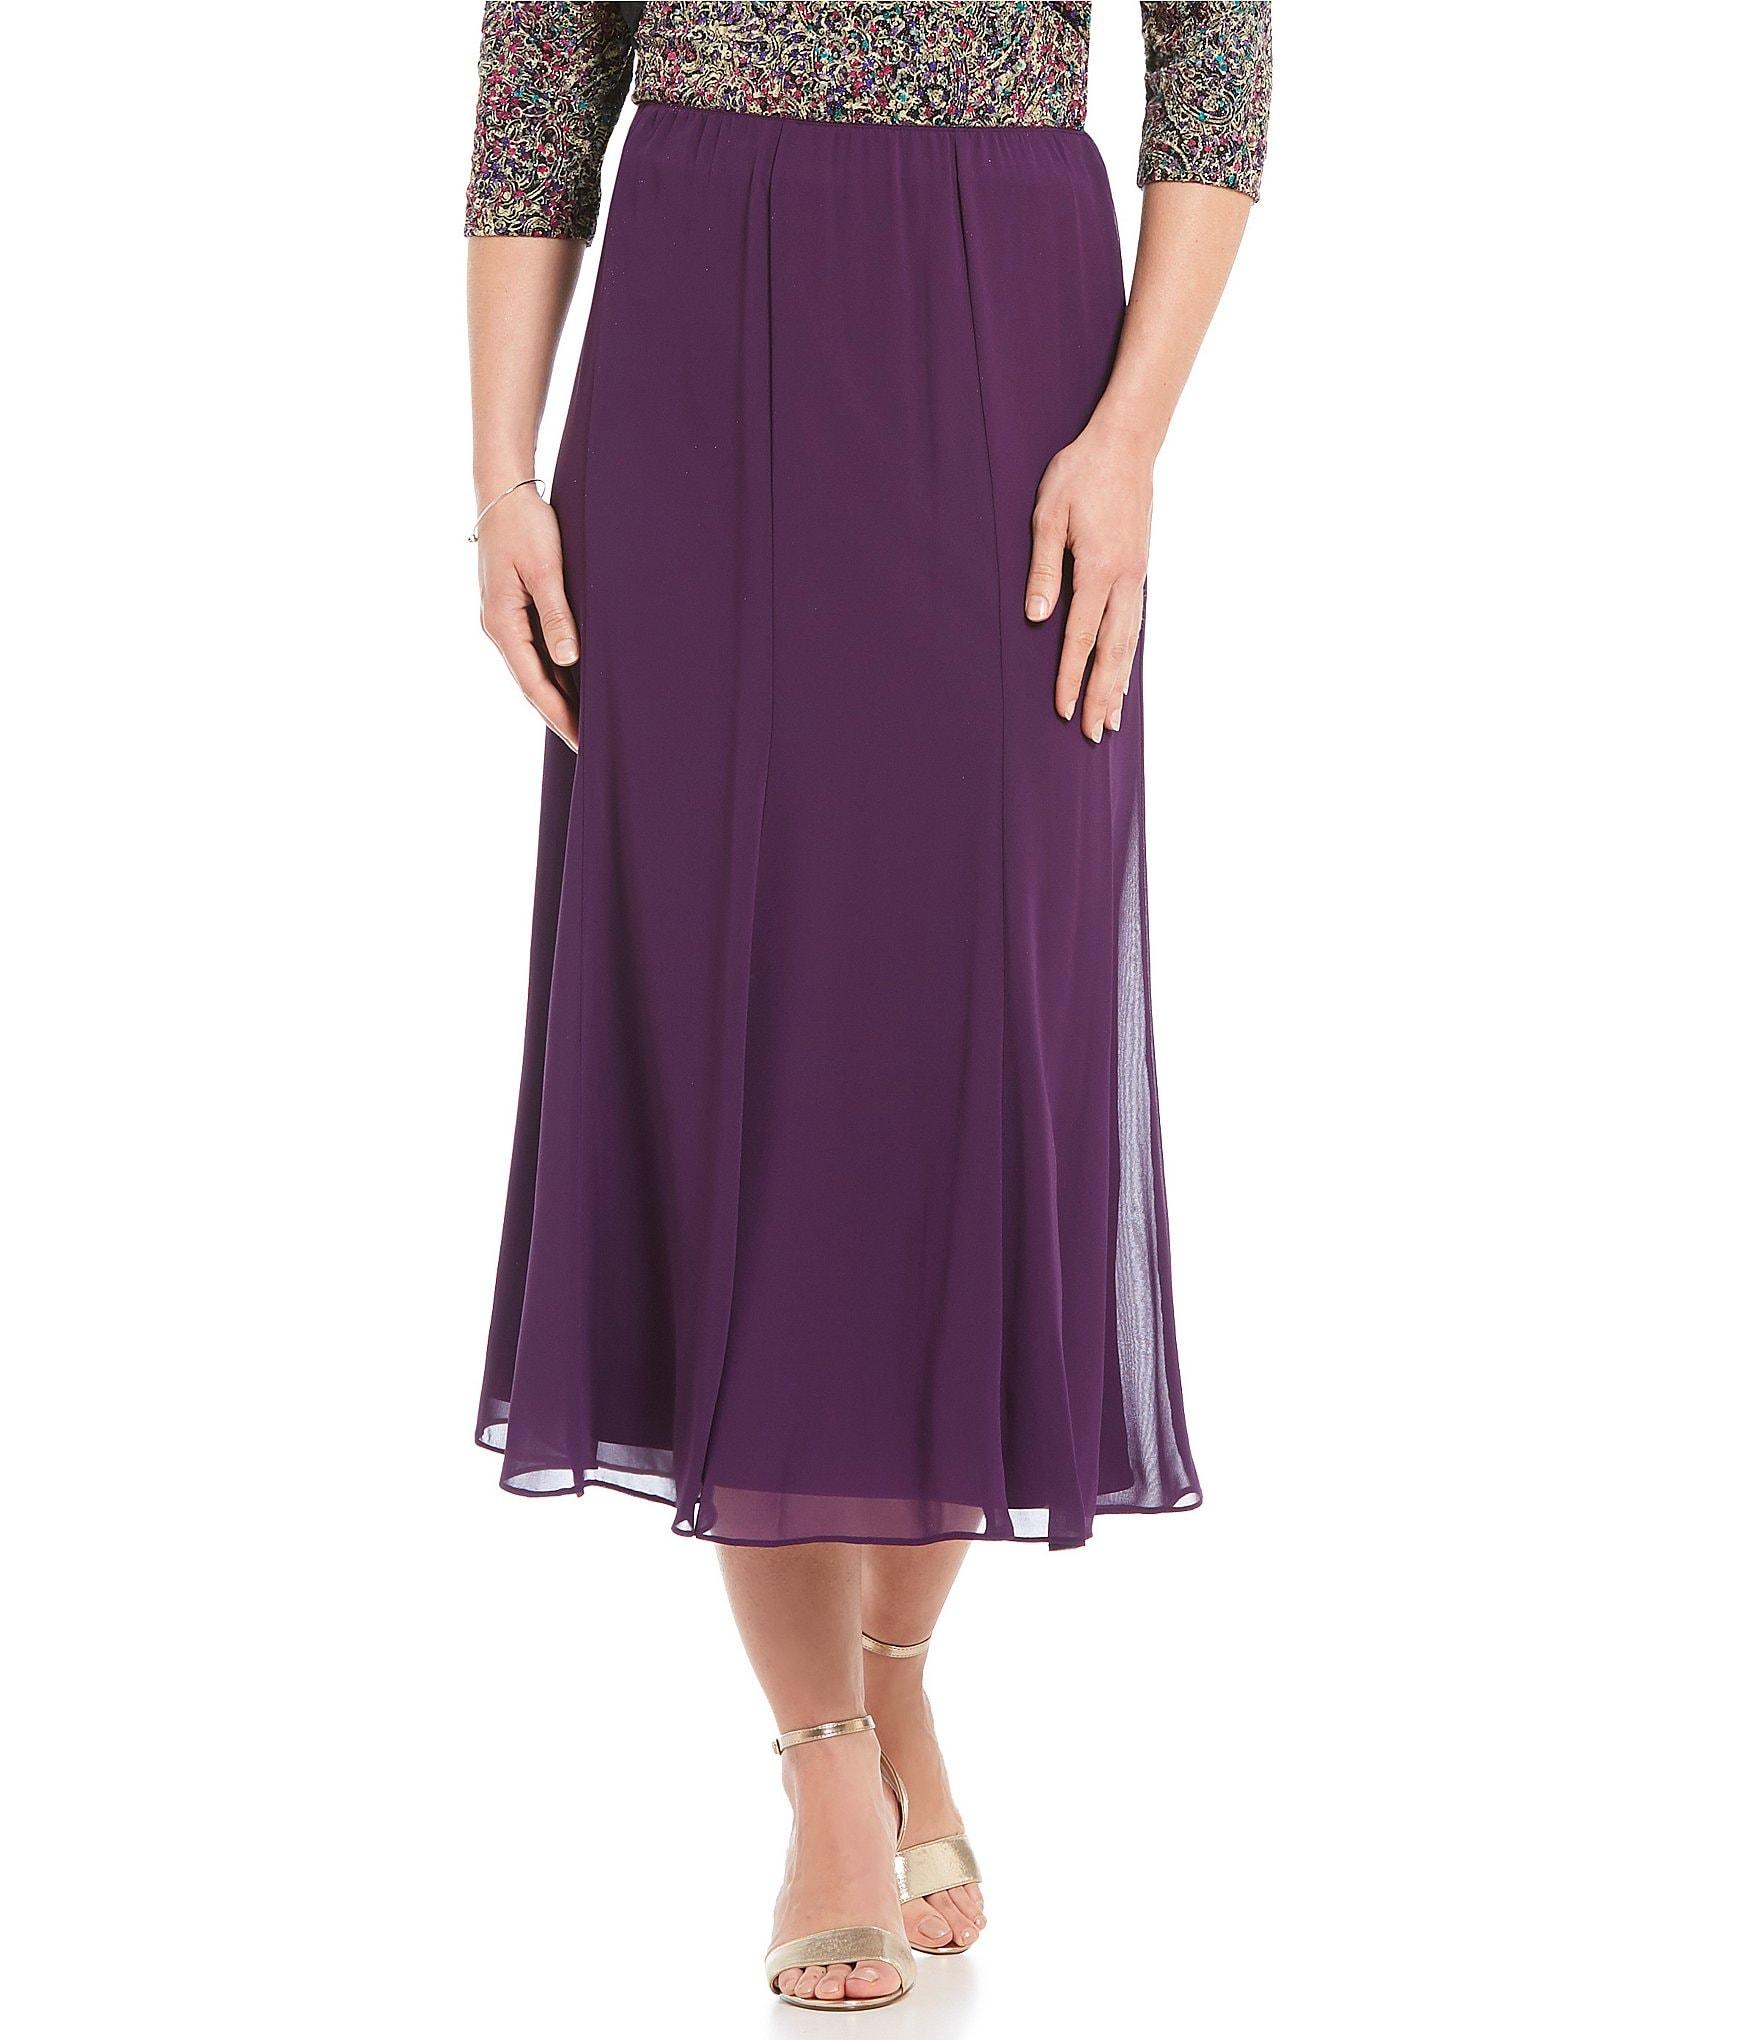 Dillard S Wedding Registry: Alex Evenings Chiffon Skirt